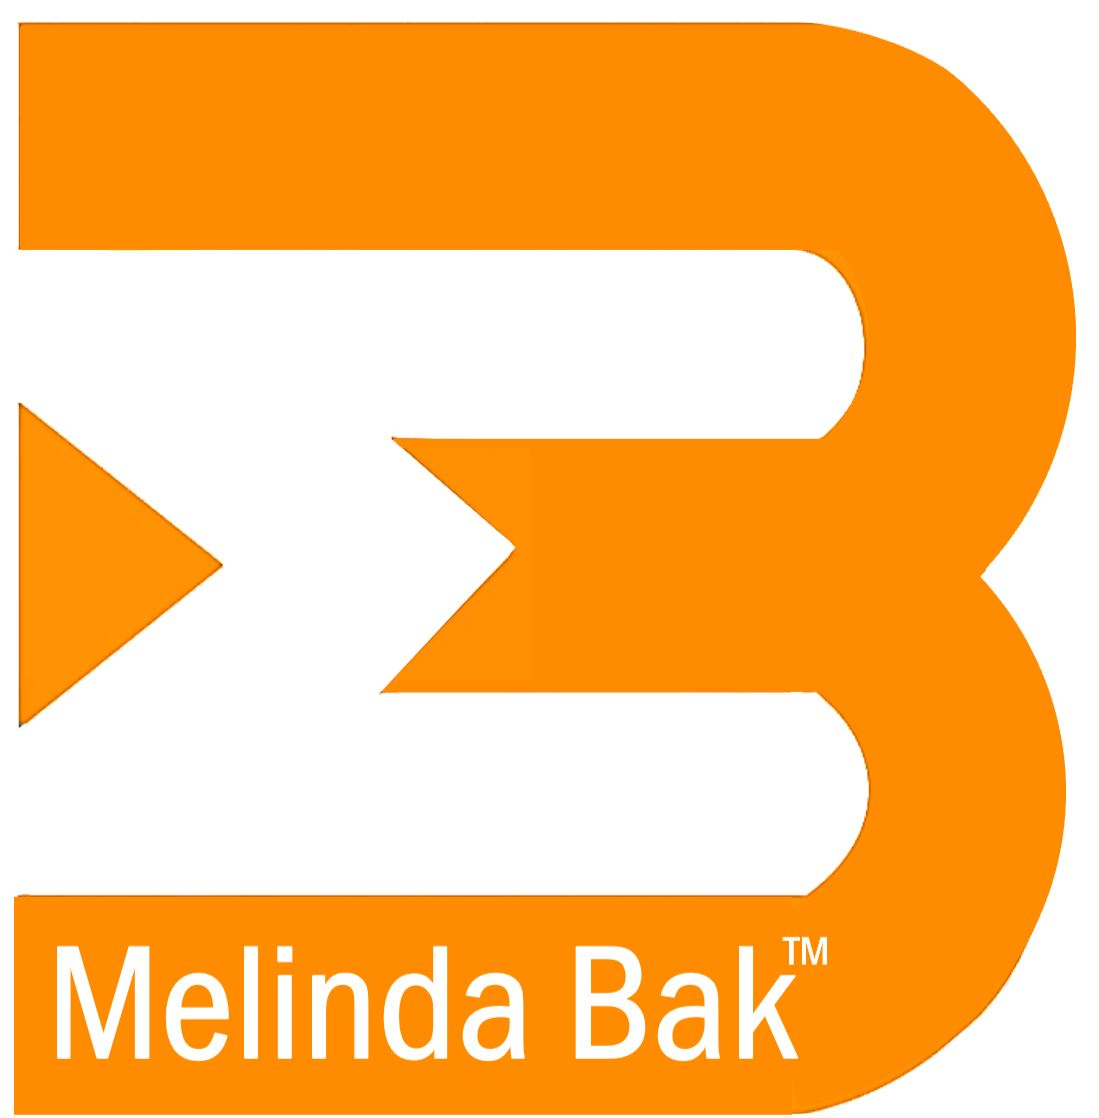 Melinda Bak, communications strategist, journalist, author, certified digital marketing professional - knows change-management, neural-messaging amd turn-around communications strategies and websites for small business website design